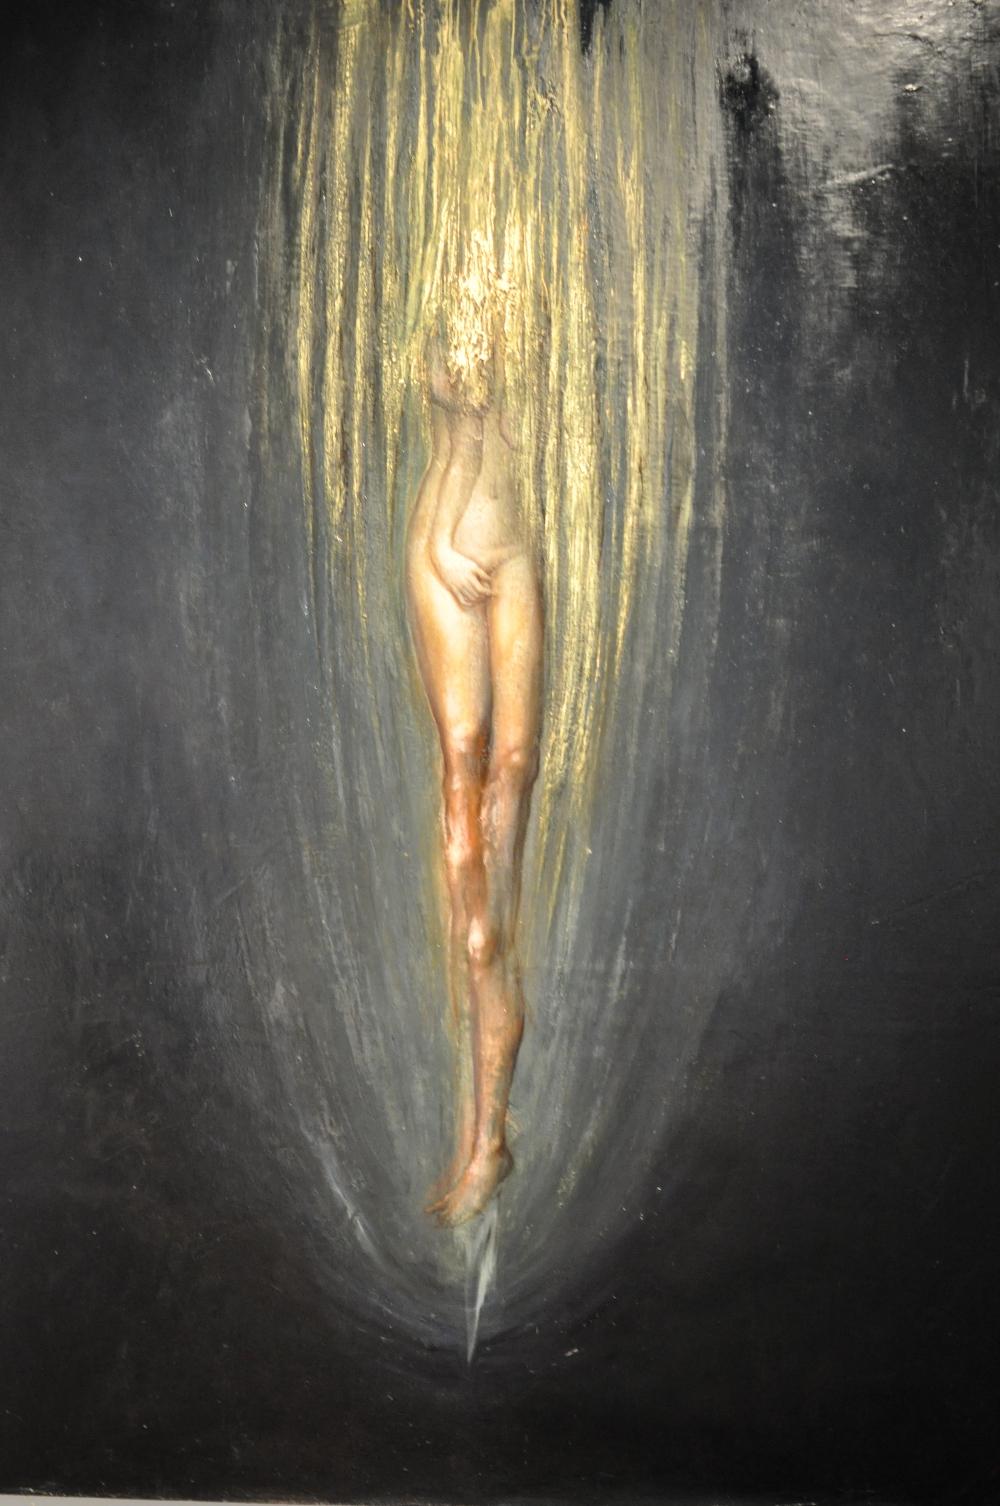 rocaille-blog-agostino-arrivabene-mostra-anastasis-casa-mantegna-mantova (11)